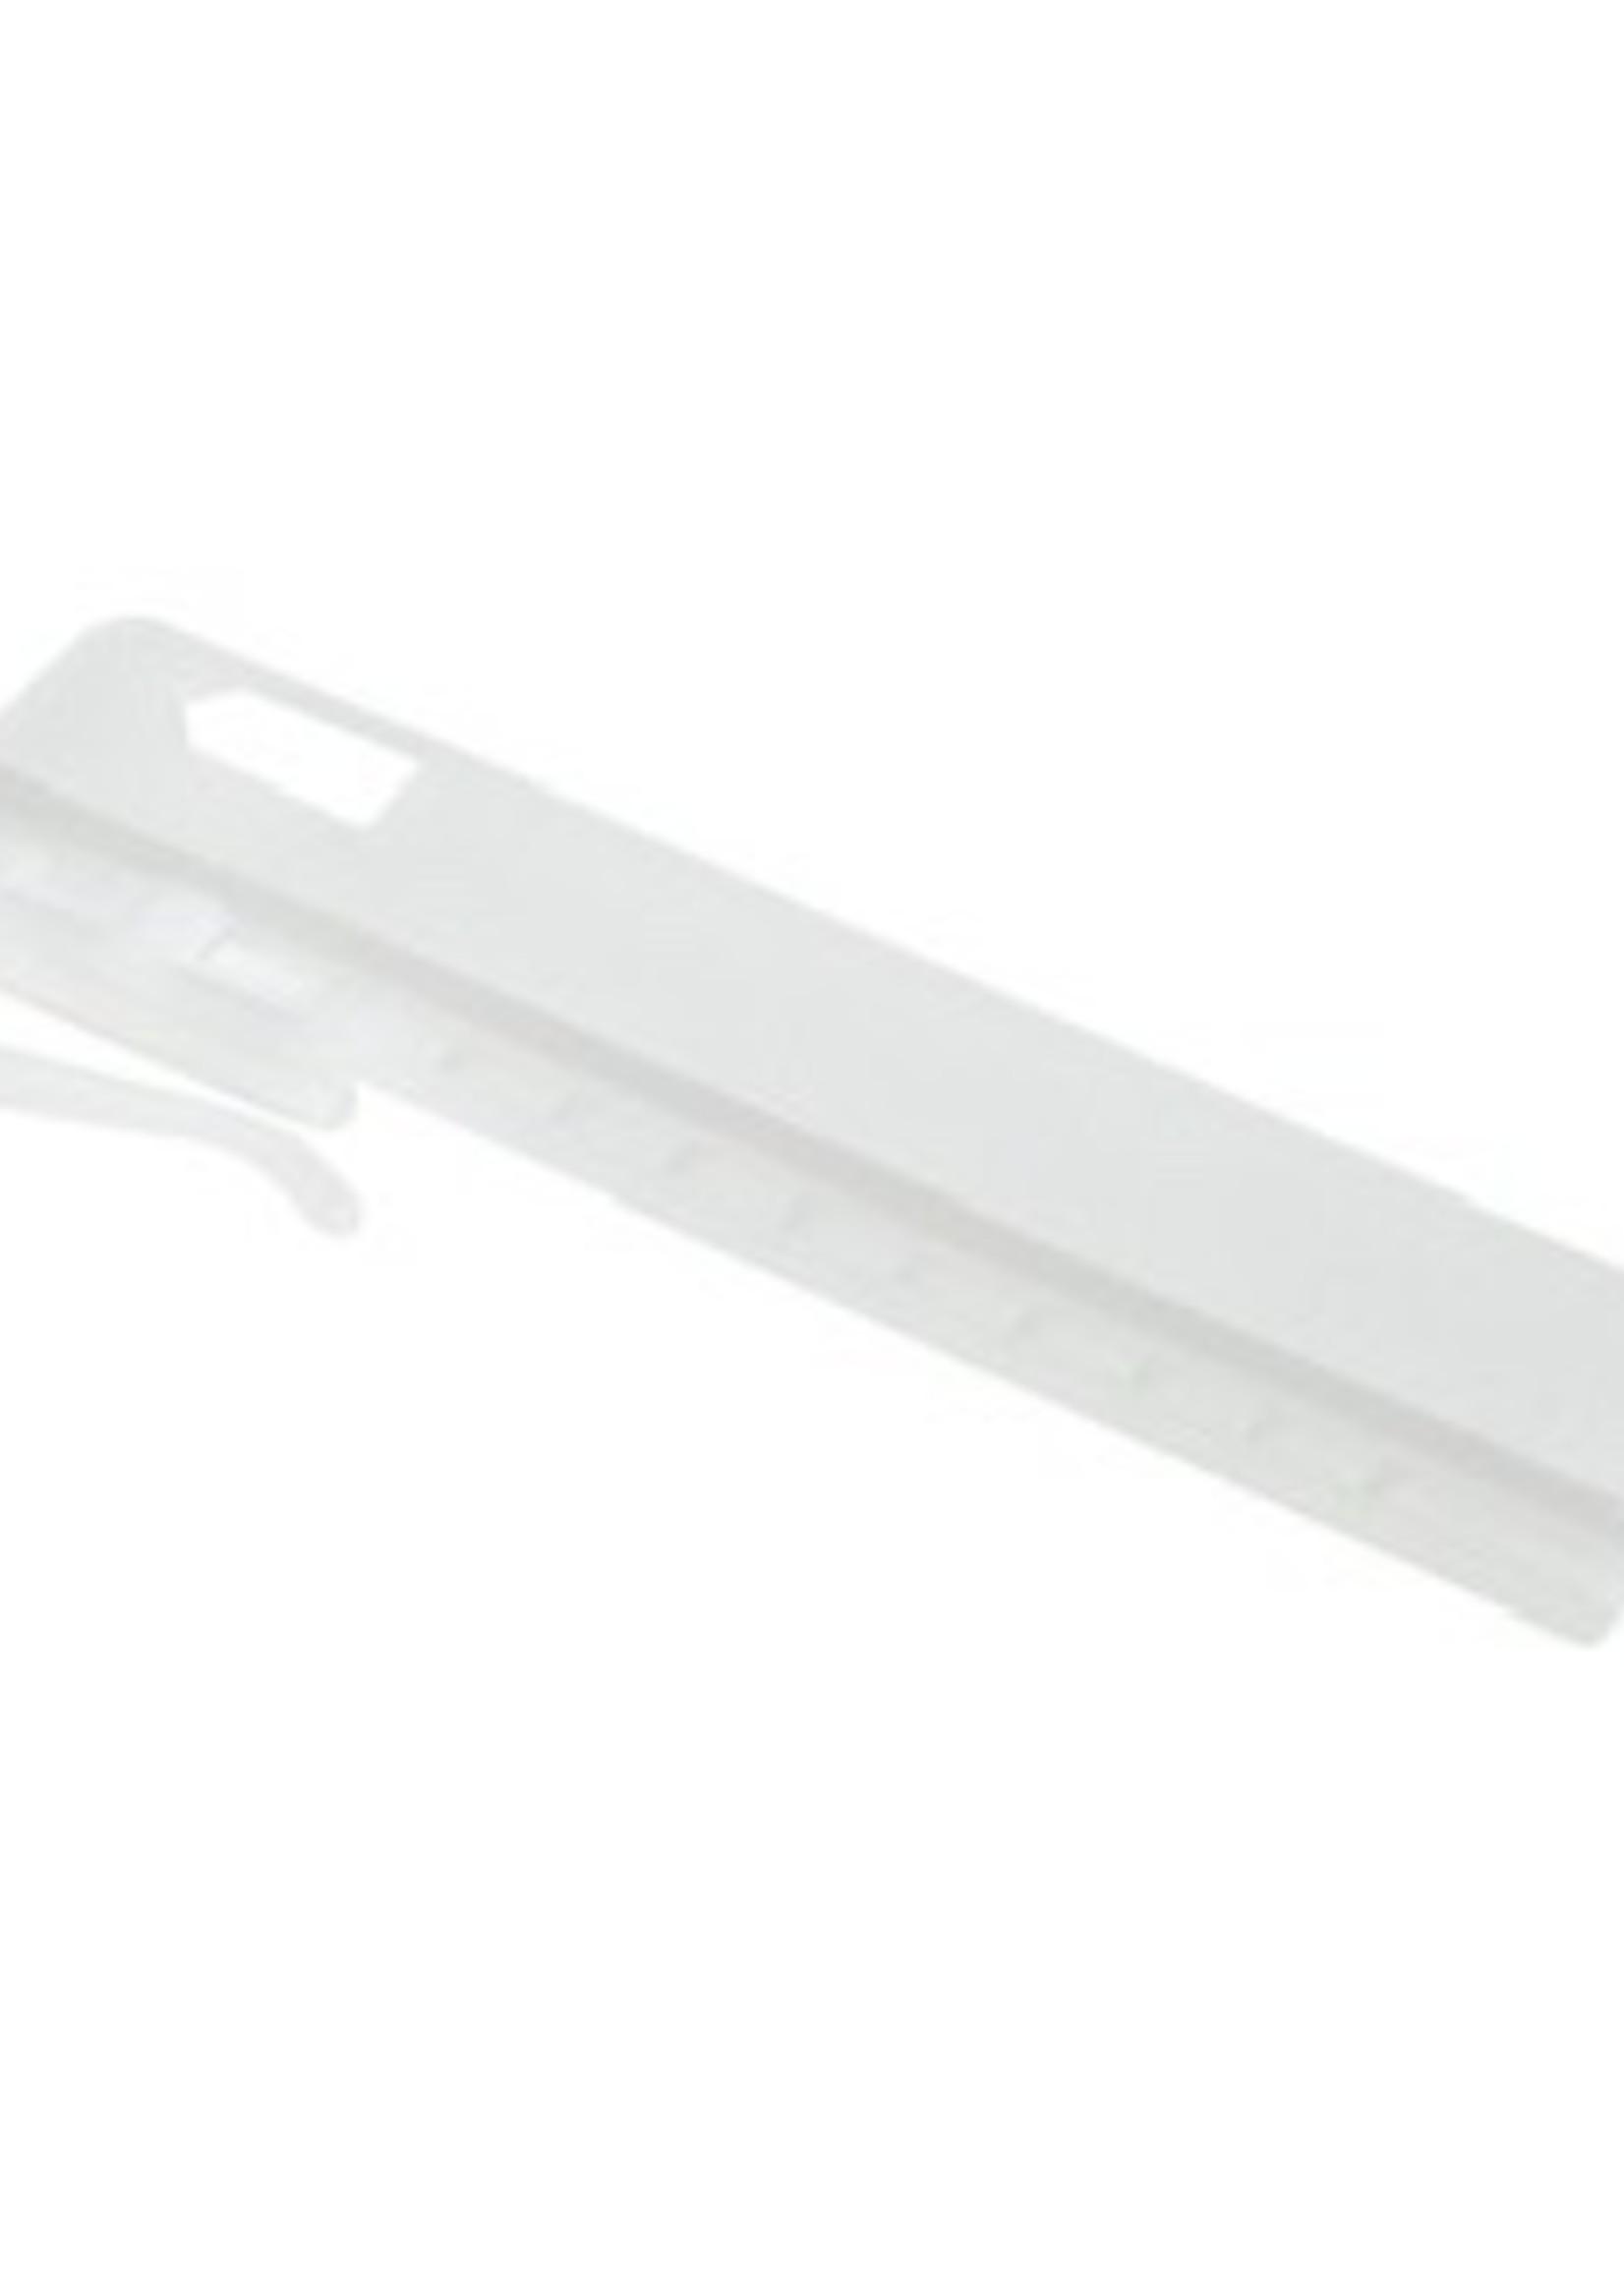 Mobyflex Innaai verstelbare gordijnhaak 7,5cm  verpakt per 500 stuks